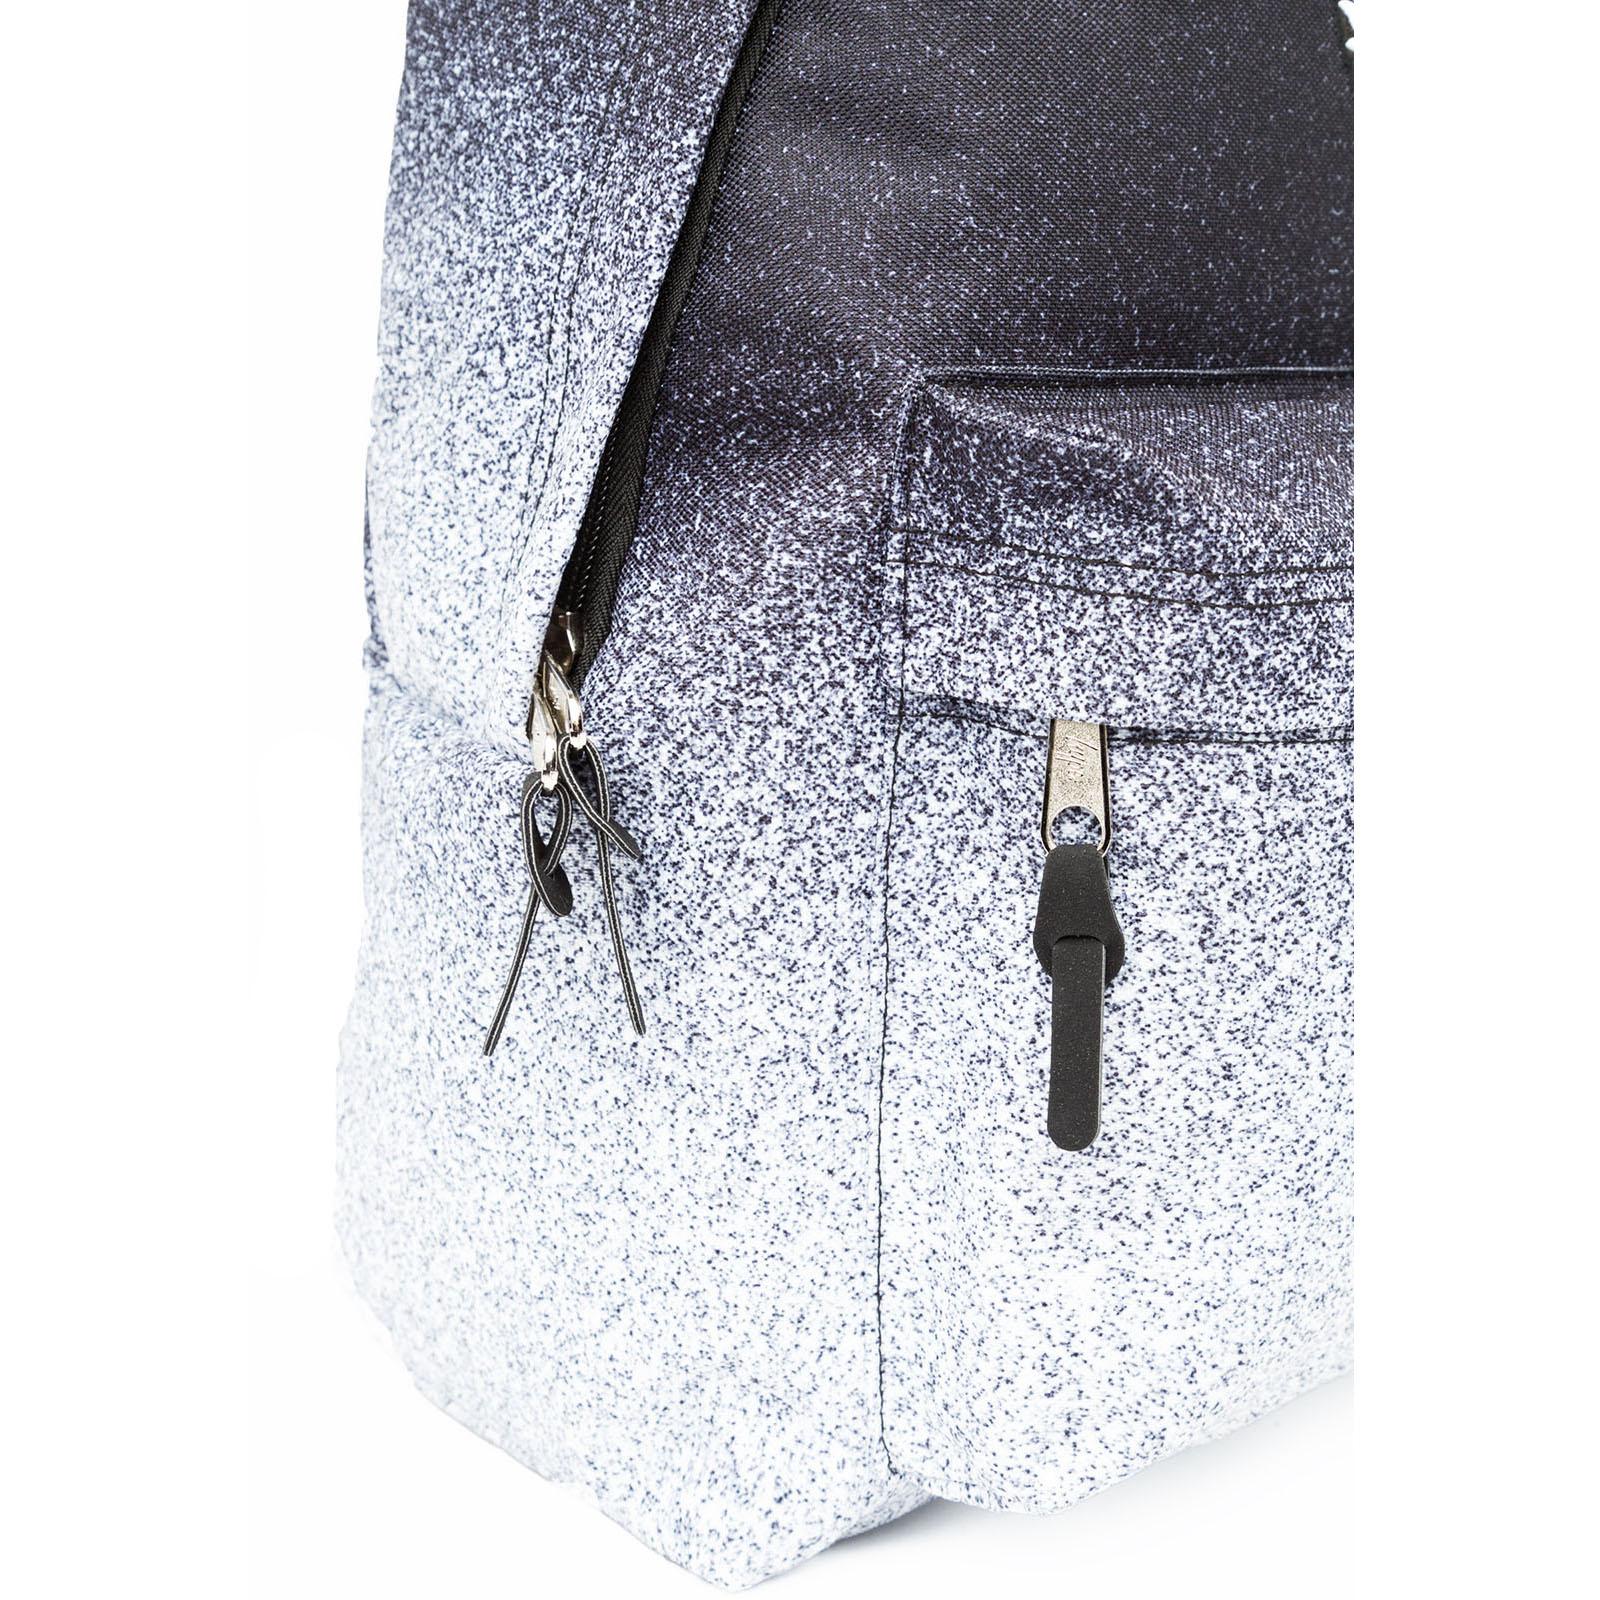 Unisexe-Hype-Sac-A-Dos-Ecole-Gym-SACS-pochettes-pencil-case miniature 110